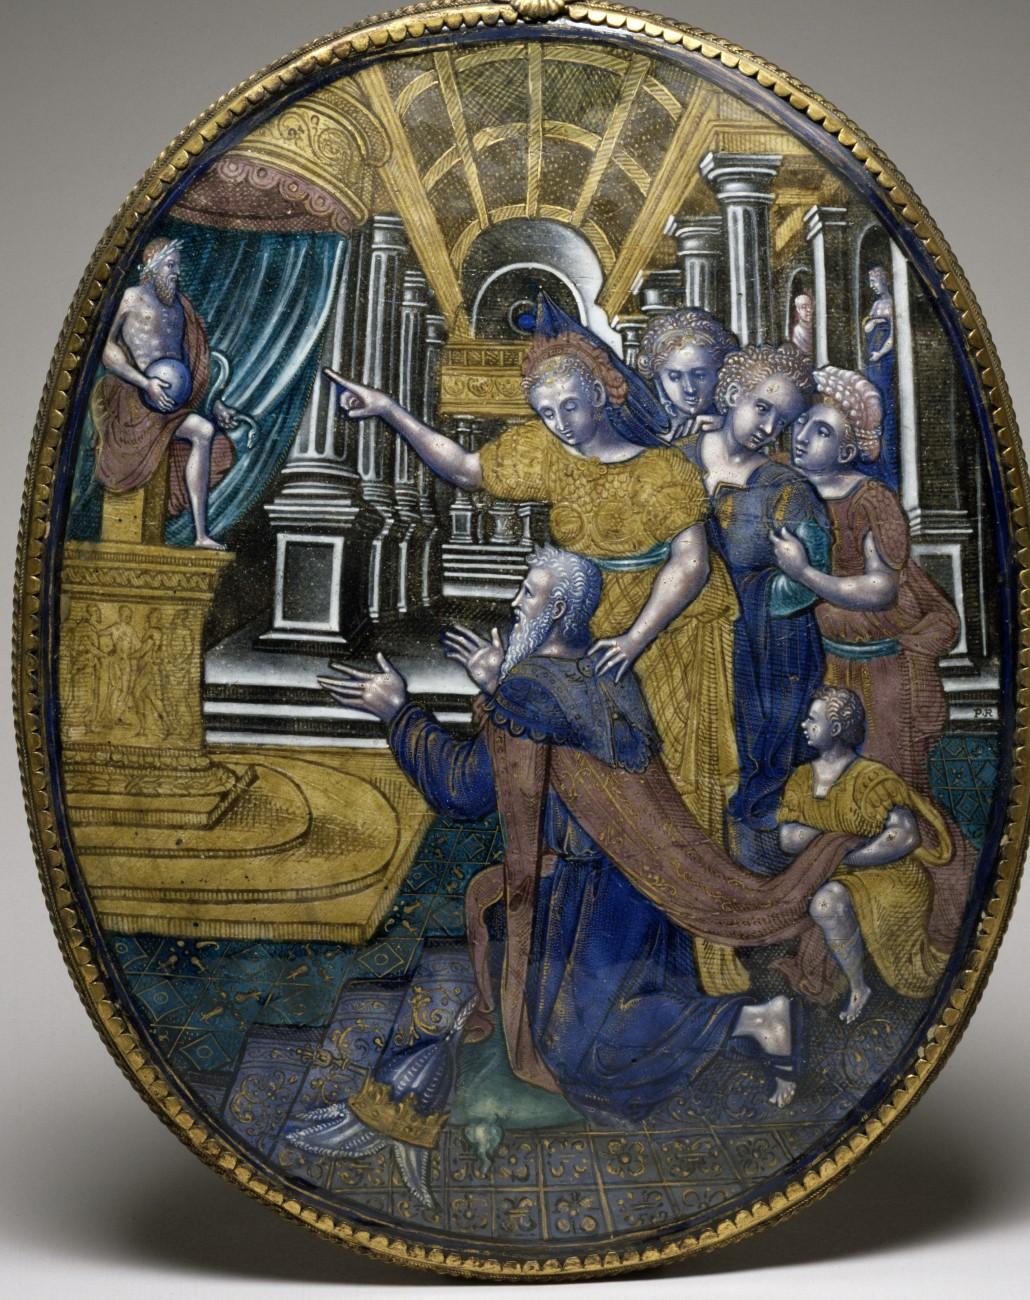 Solomon-Idolatry-Walters-e1311984106811.